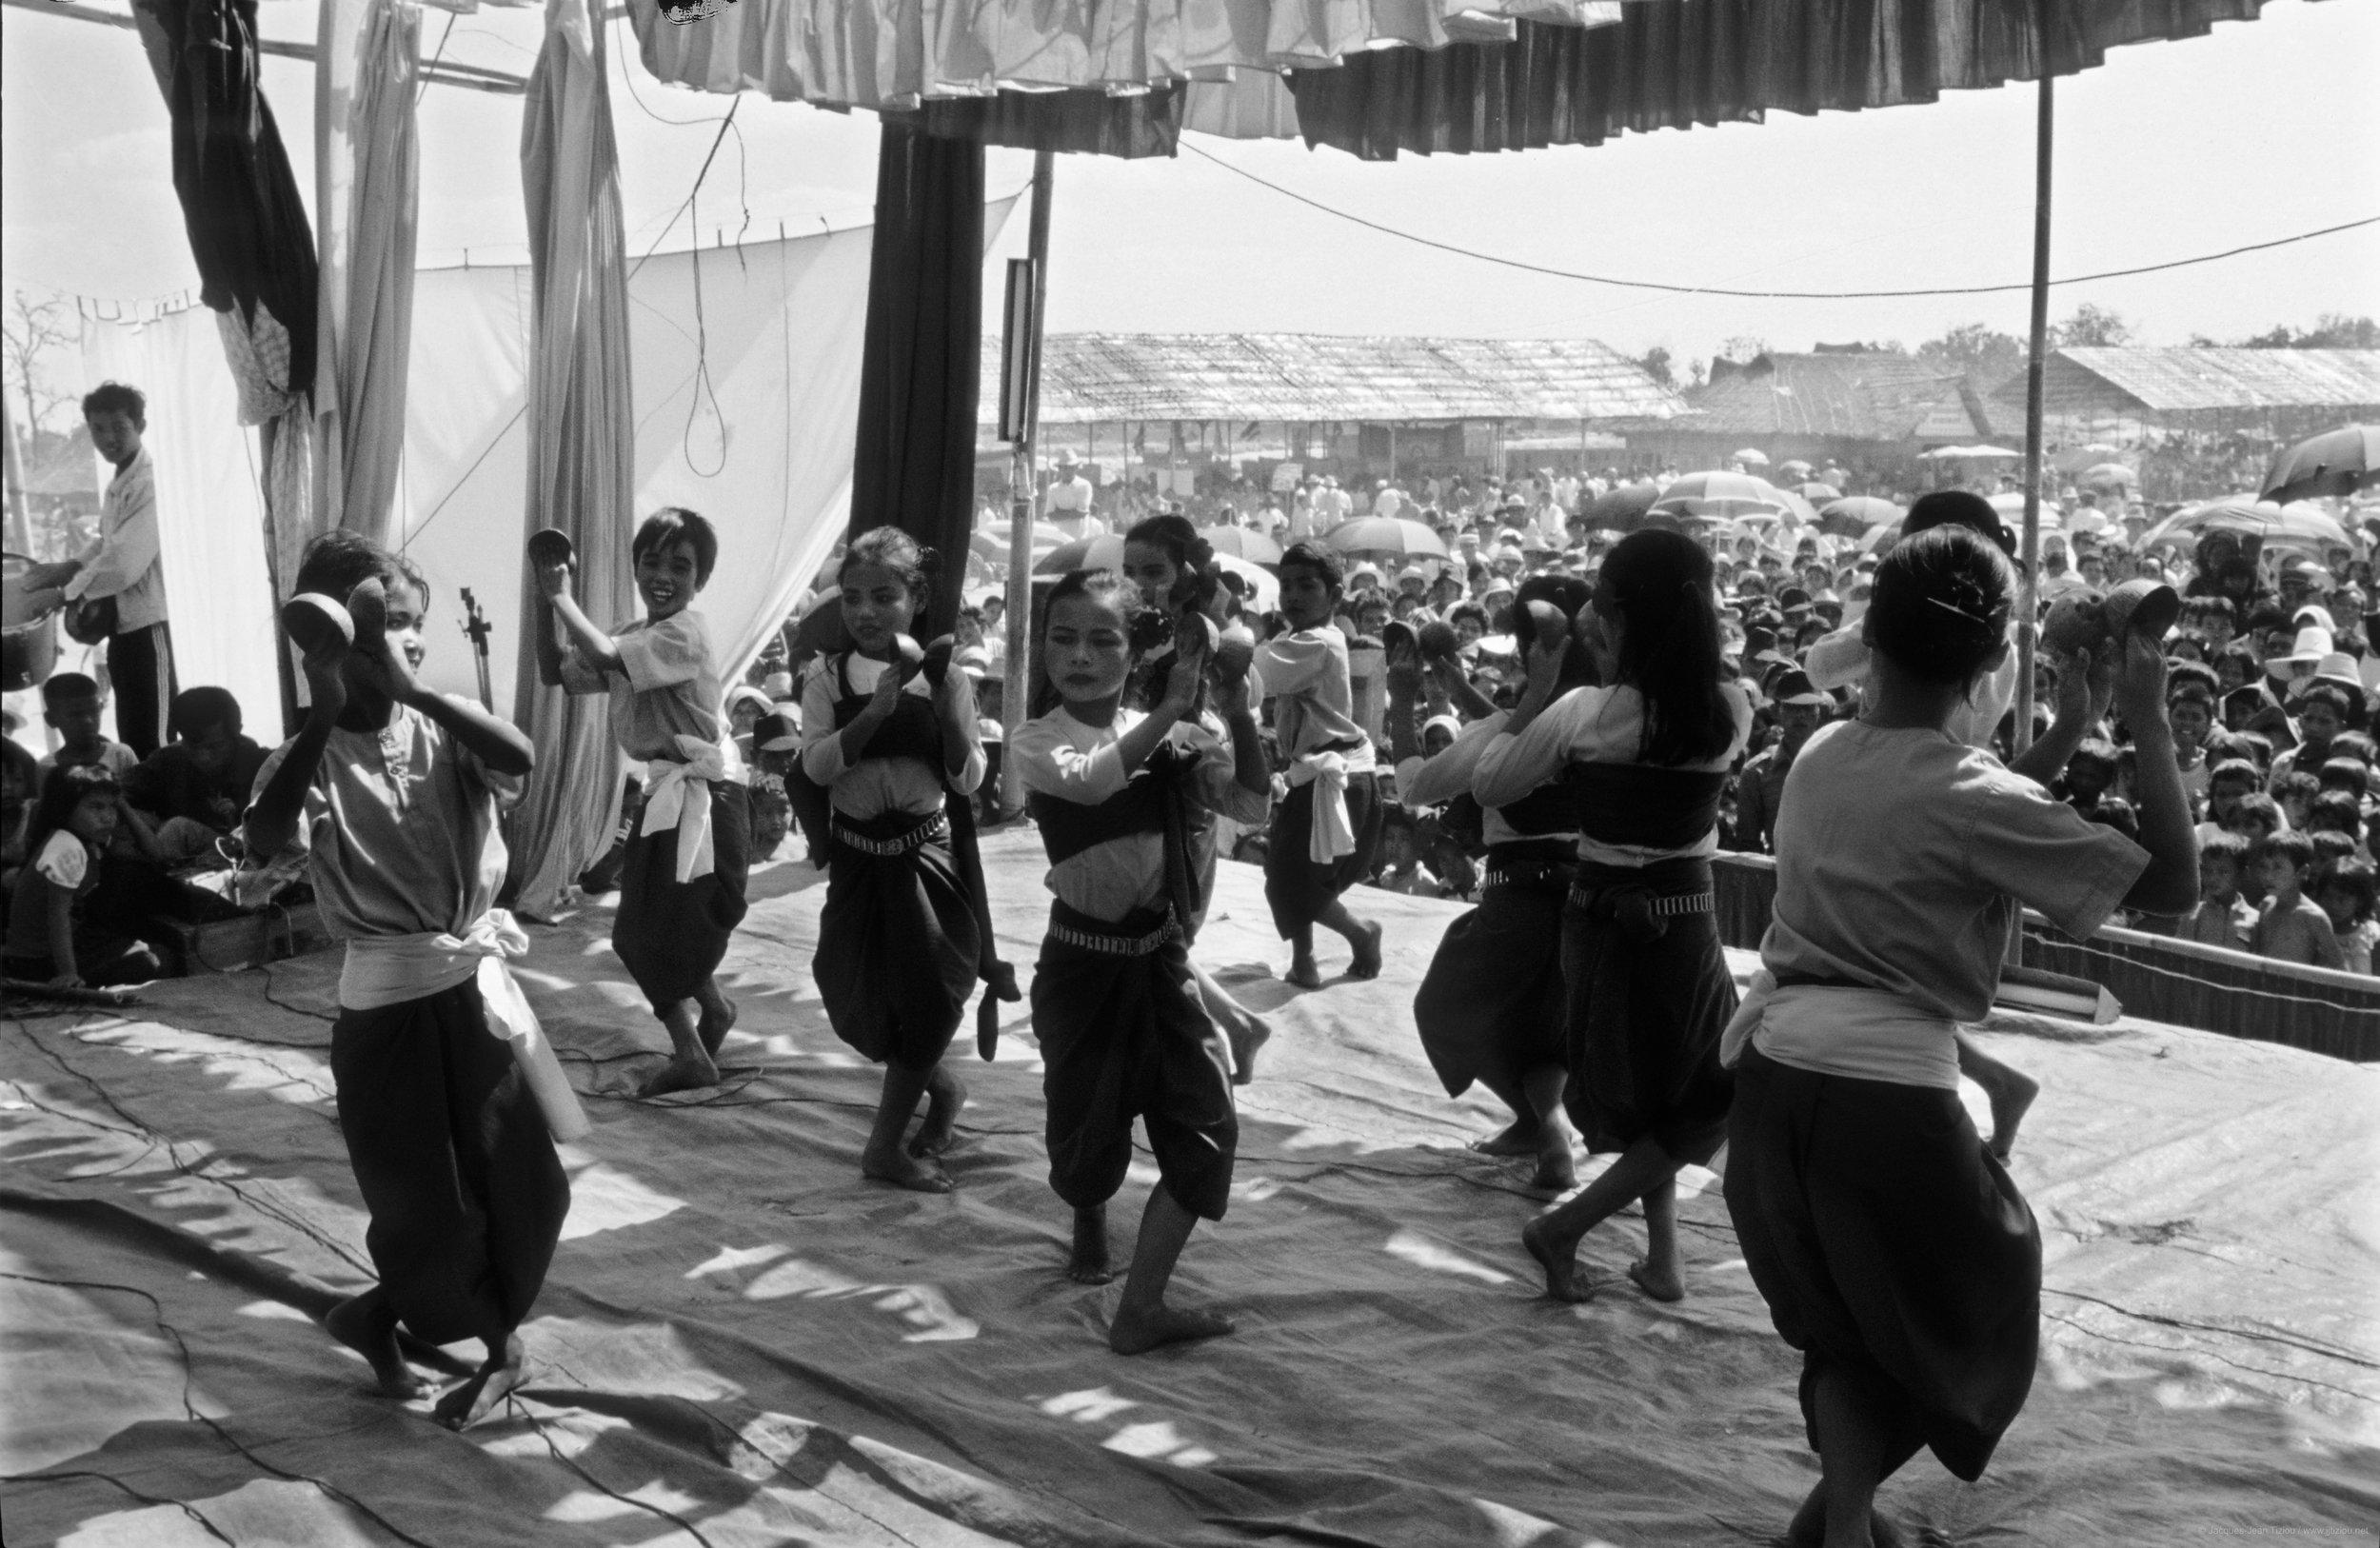 Toni Shapiro-Phim, Cambodia, Free Body Project